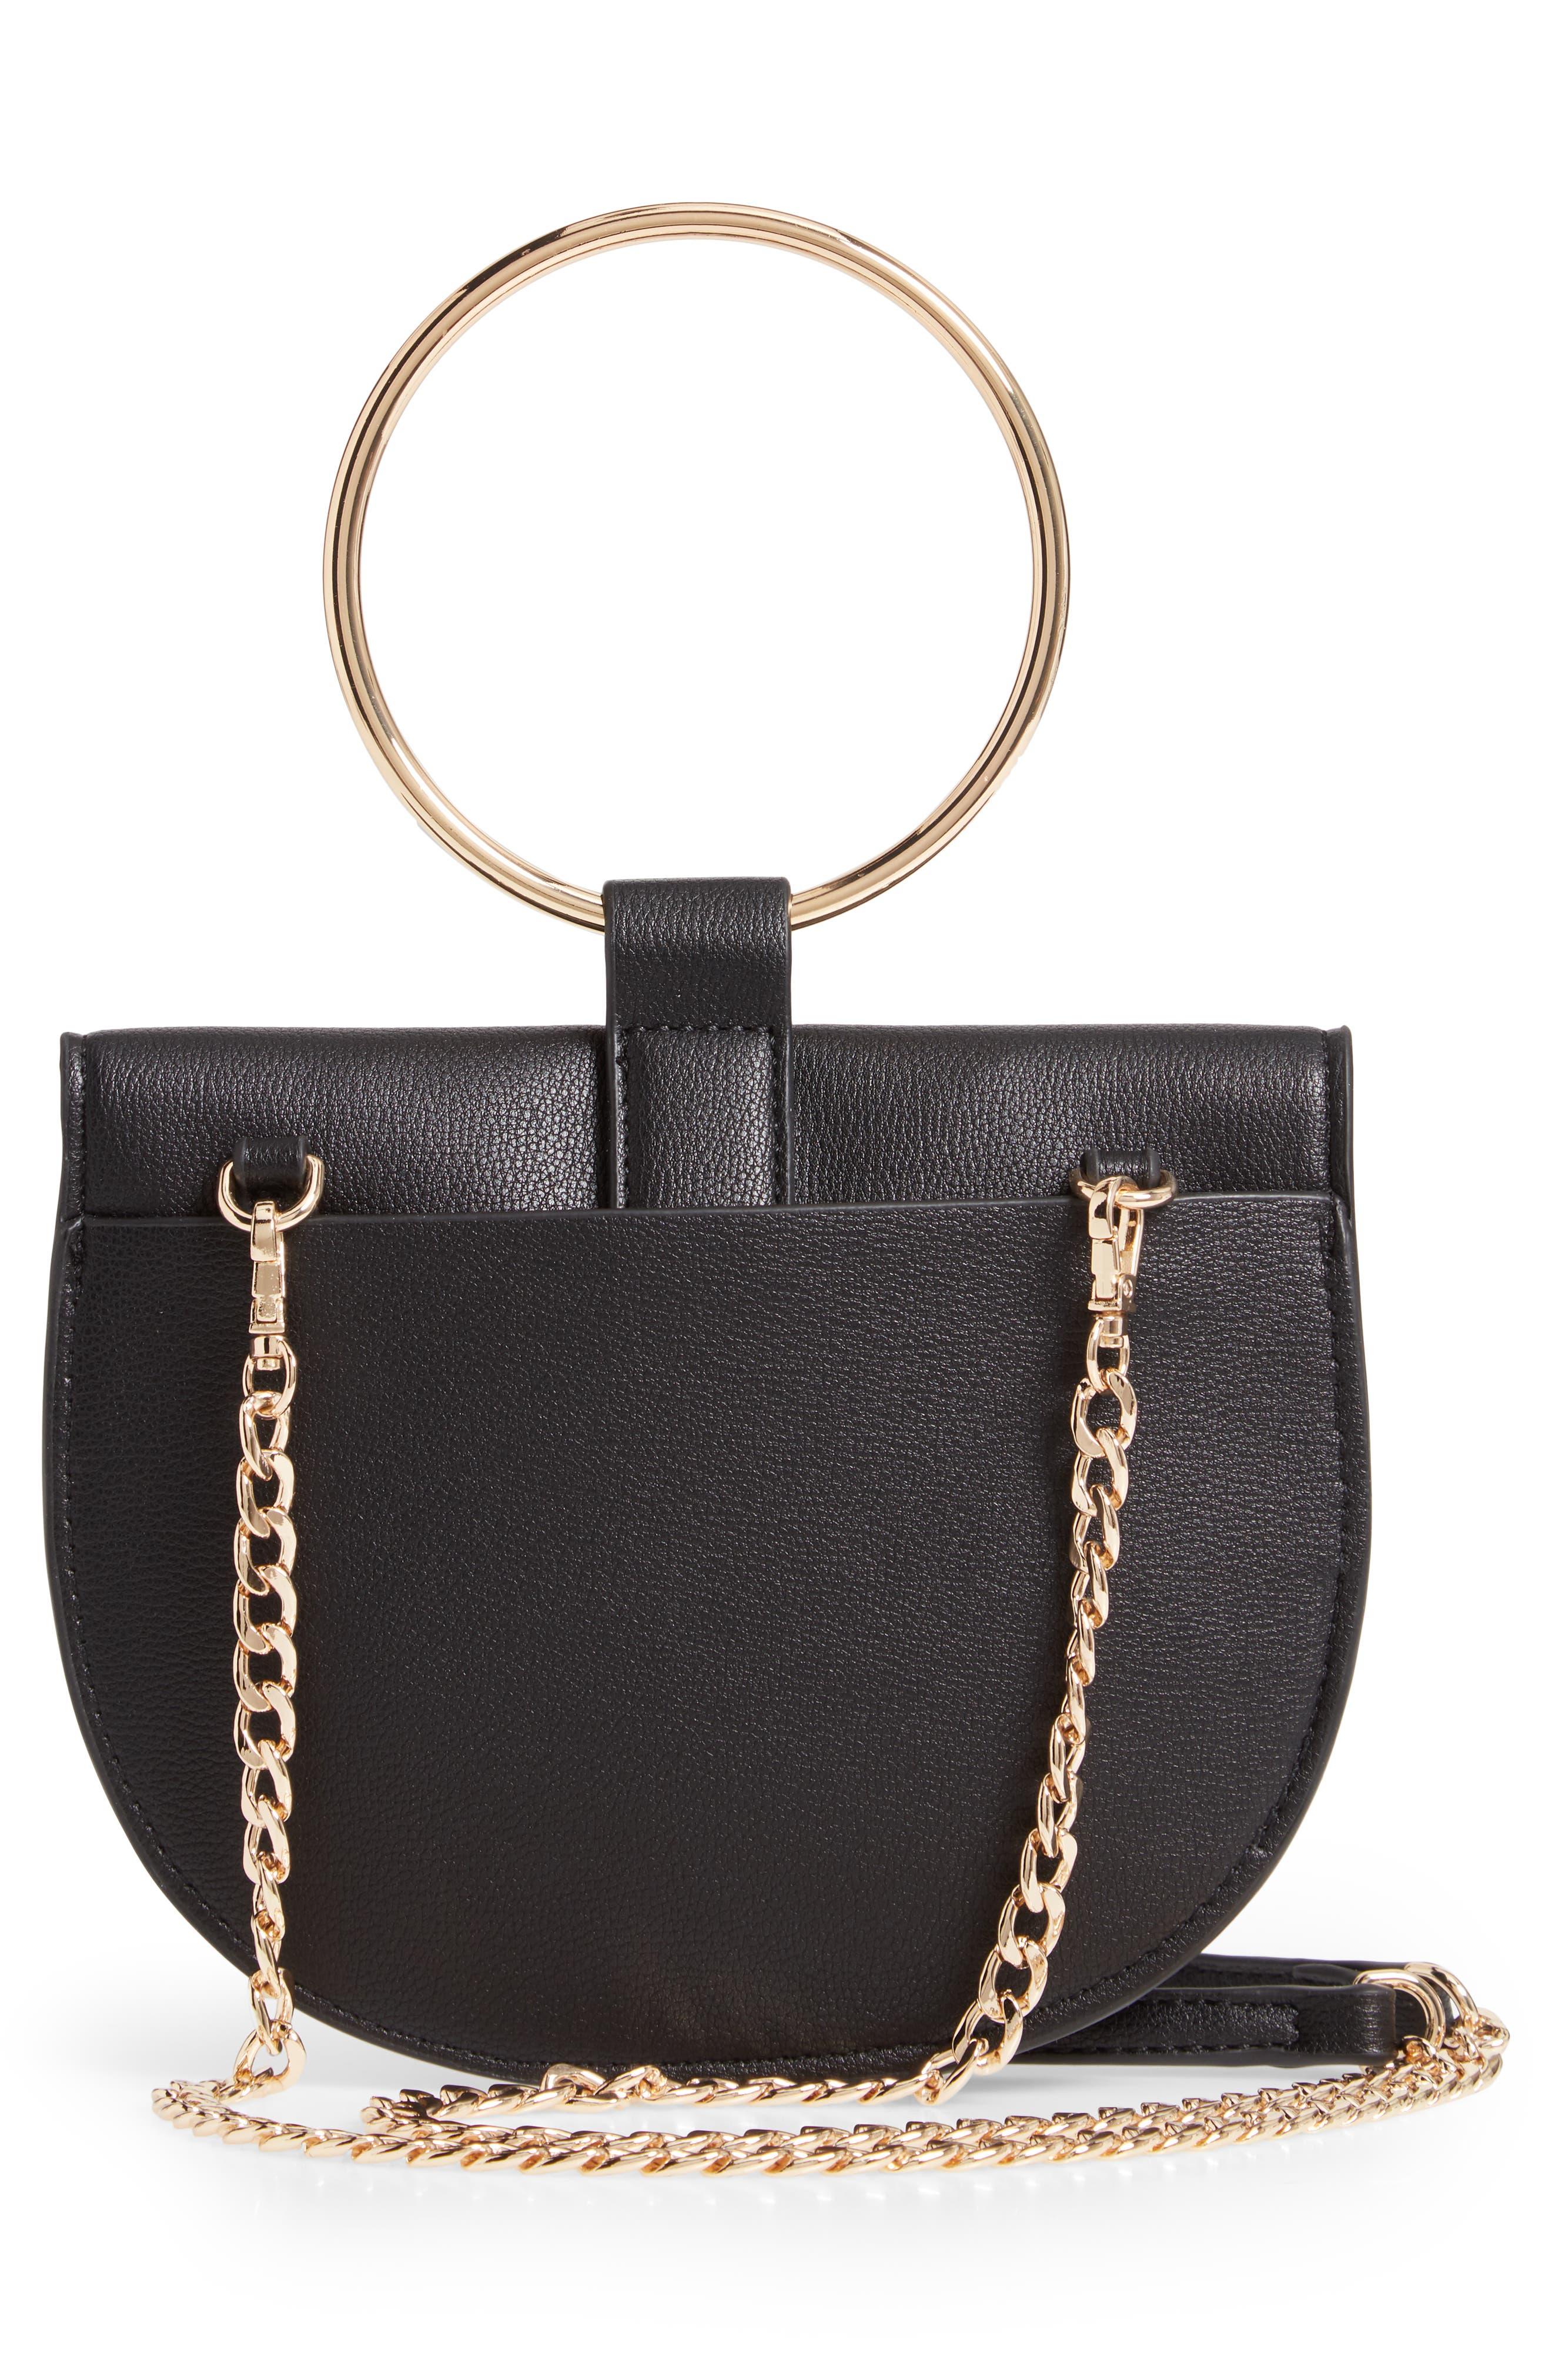 TROUVÉ, Reese Faux Leather Ring Crossbody Bag, Alternate thumbnail 3, color, BLACK